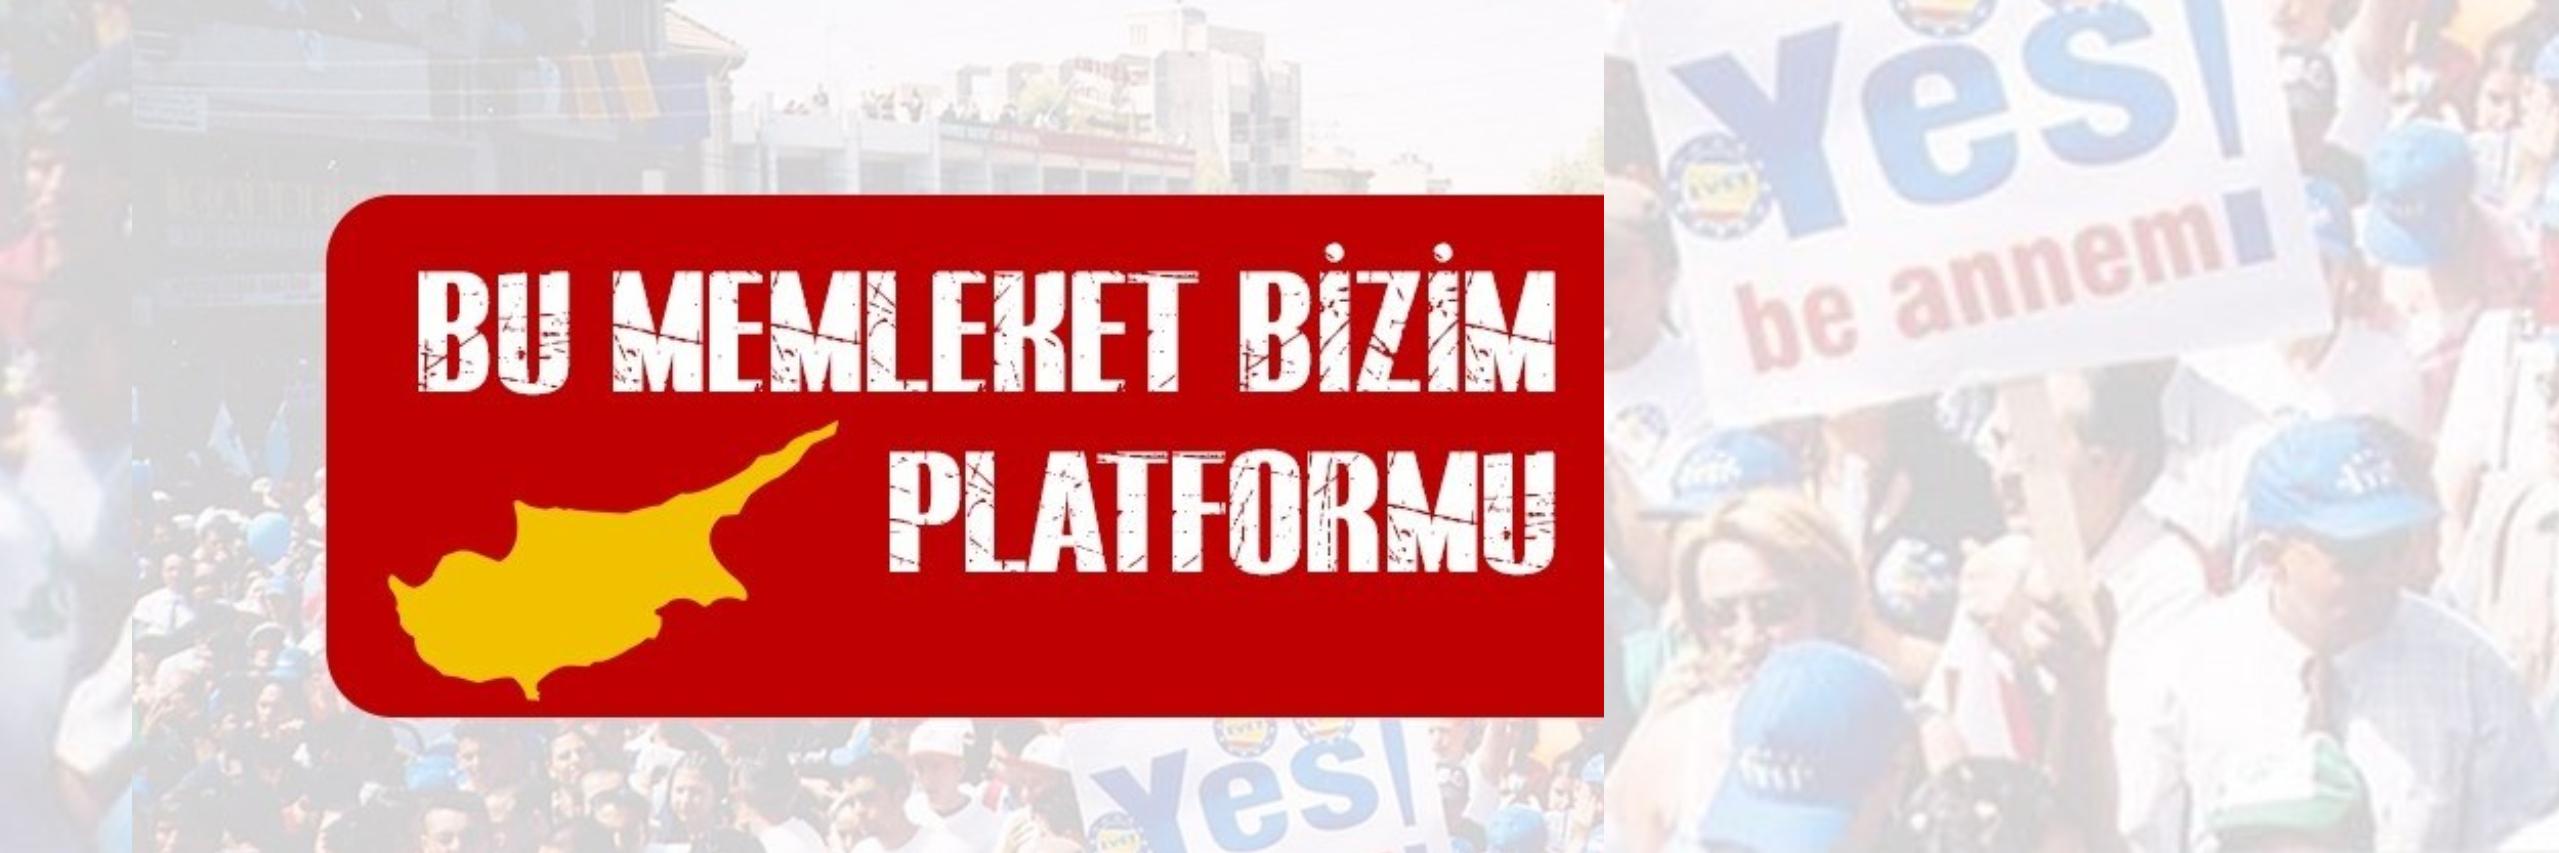 Bu Memleket Bizim Platformu, Ali Bizden ve Ahmet An'a destek belirtti